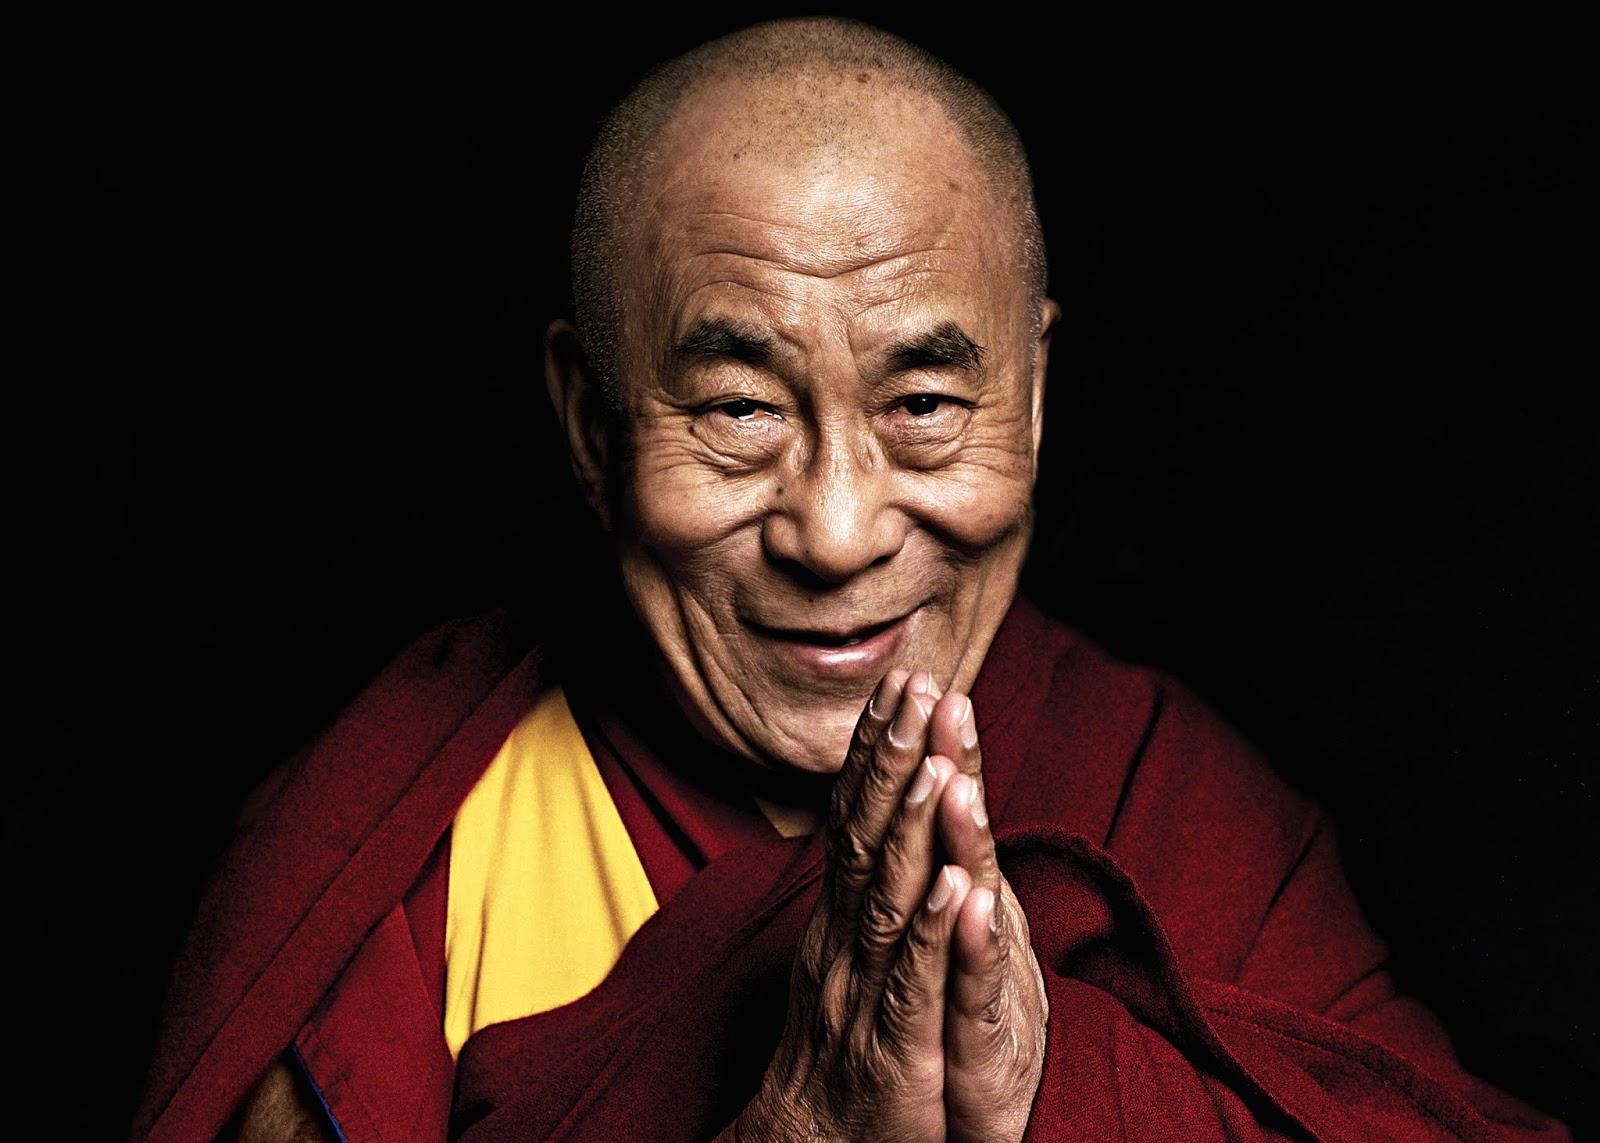 High Quality Dalai Lama Wallpapers